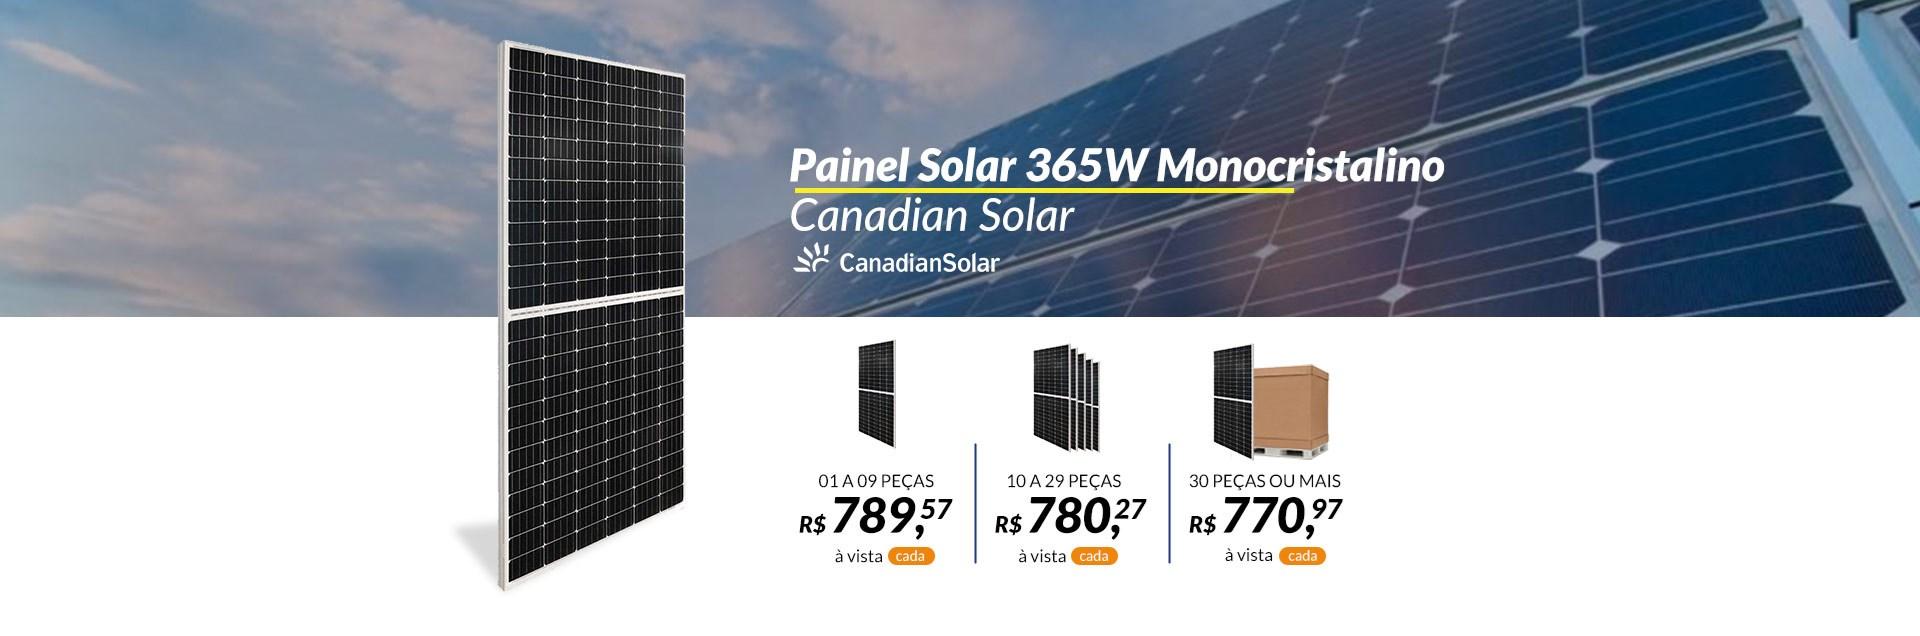 Painel Monocristalino Canadian Solar